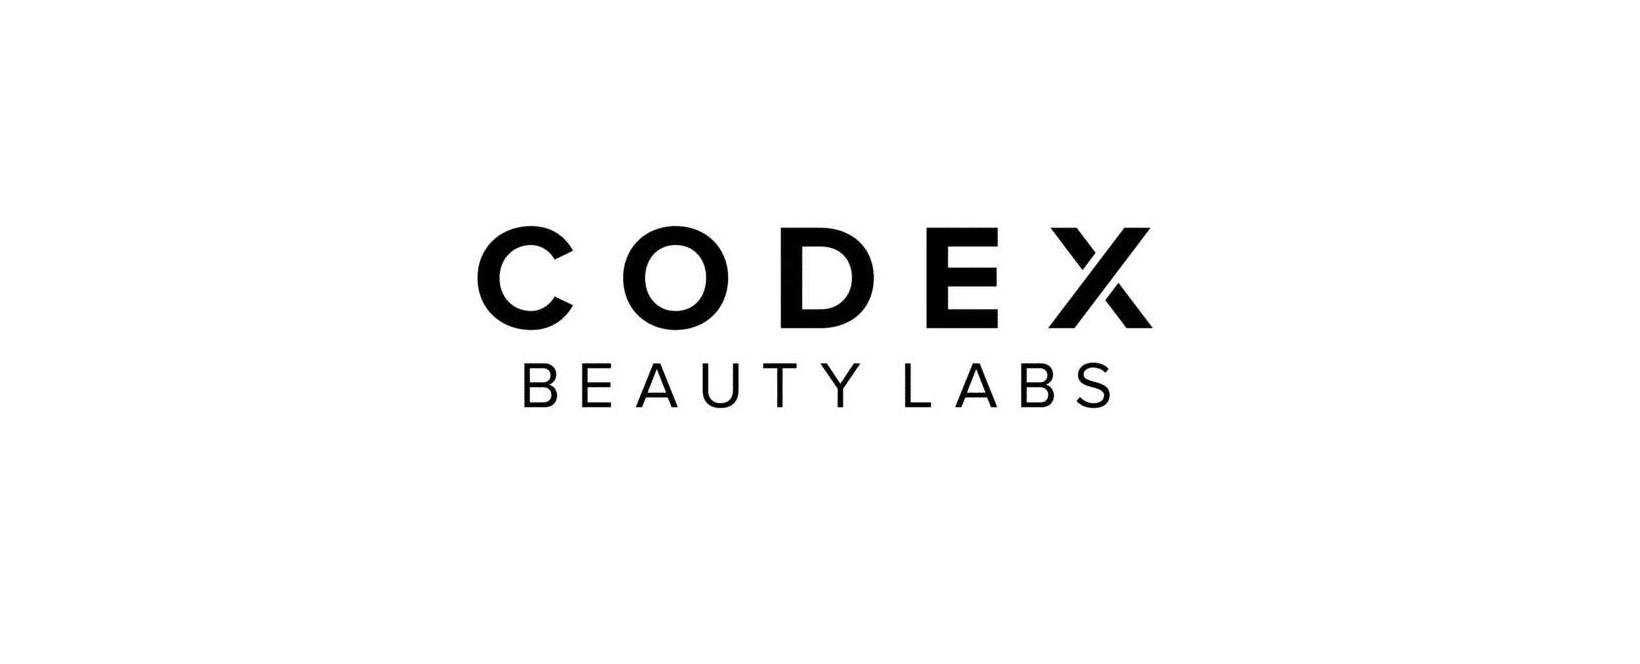 Codex Beauty Discount Code 2021